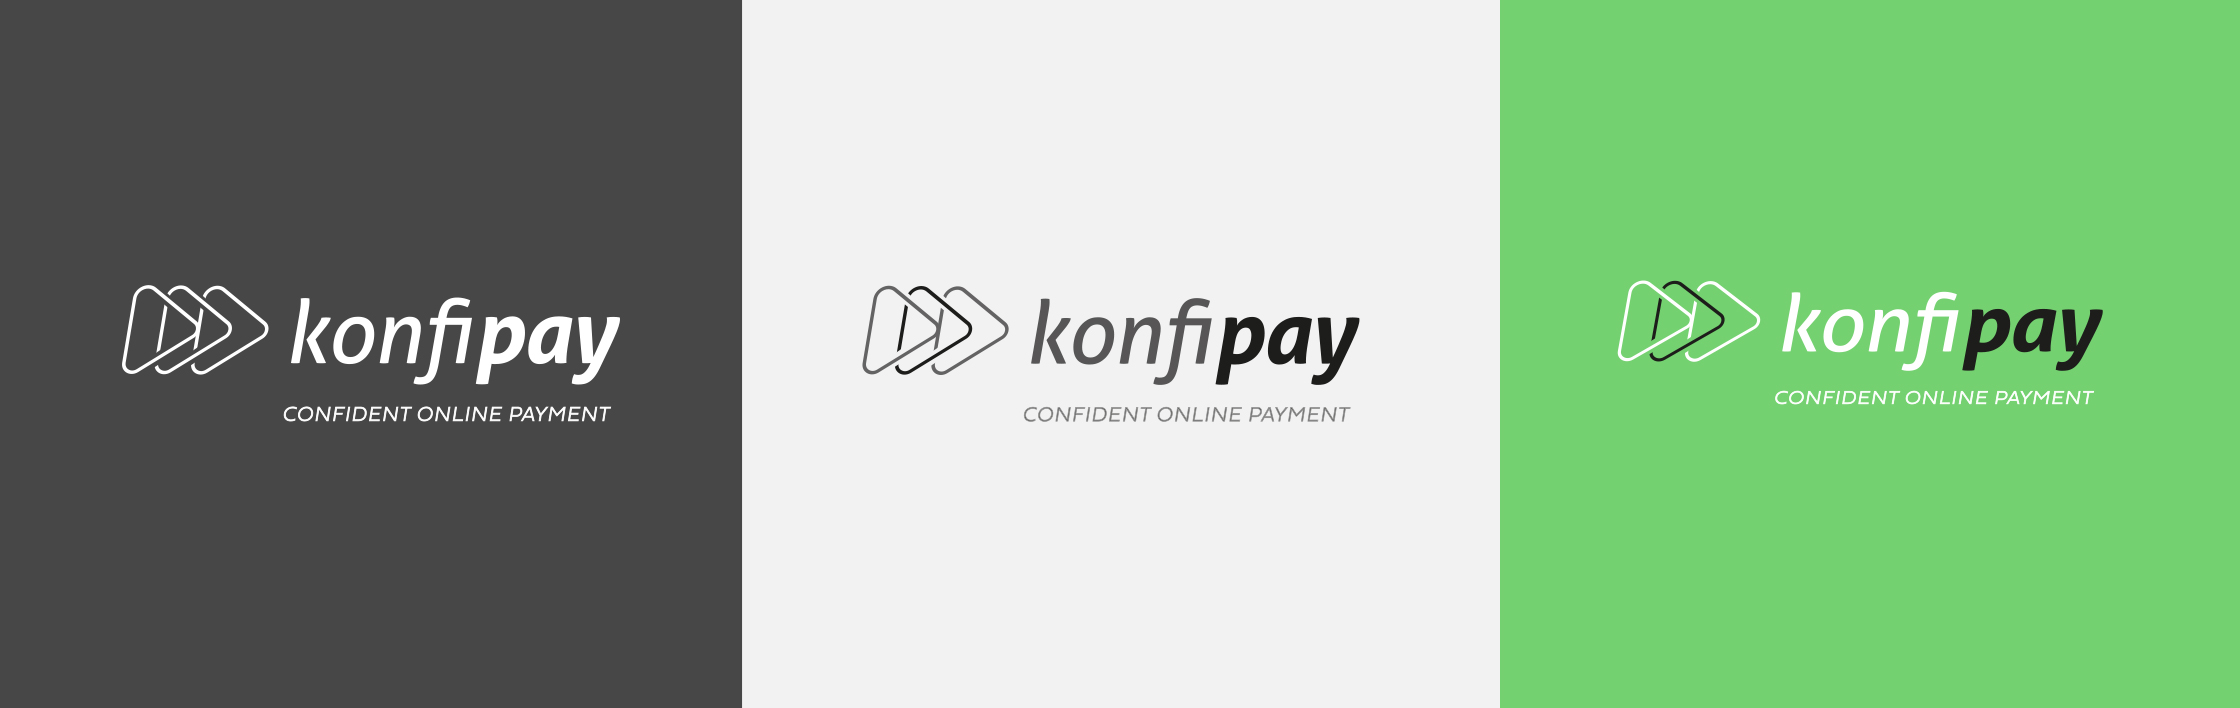 Konfipay Logovarianten